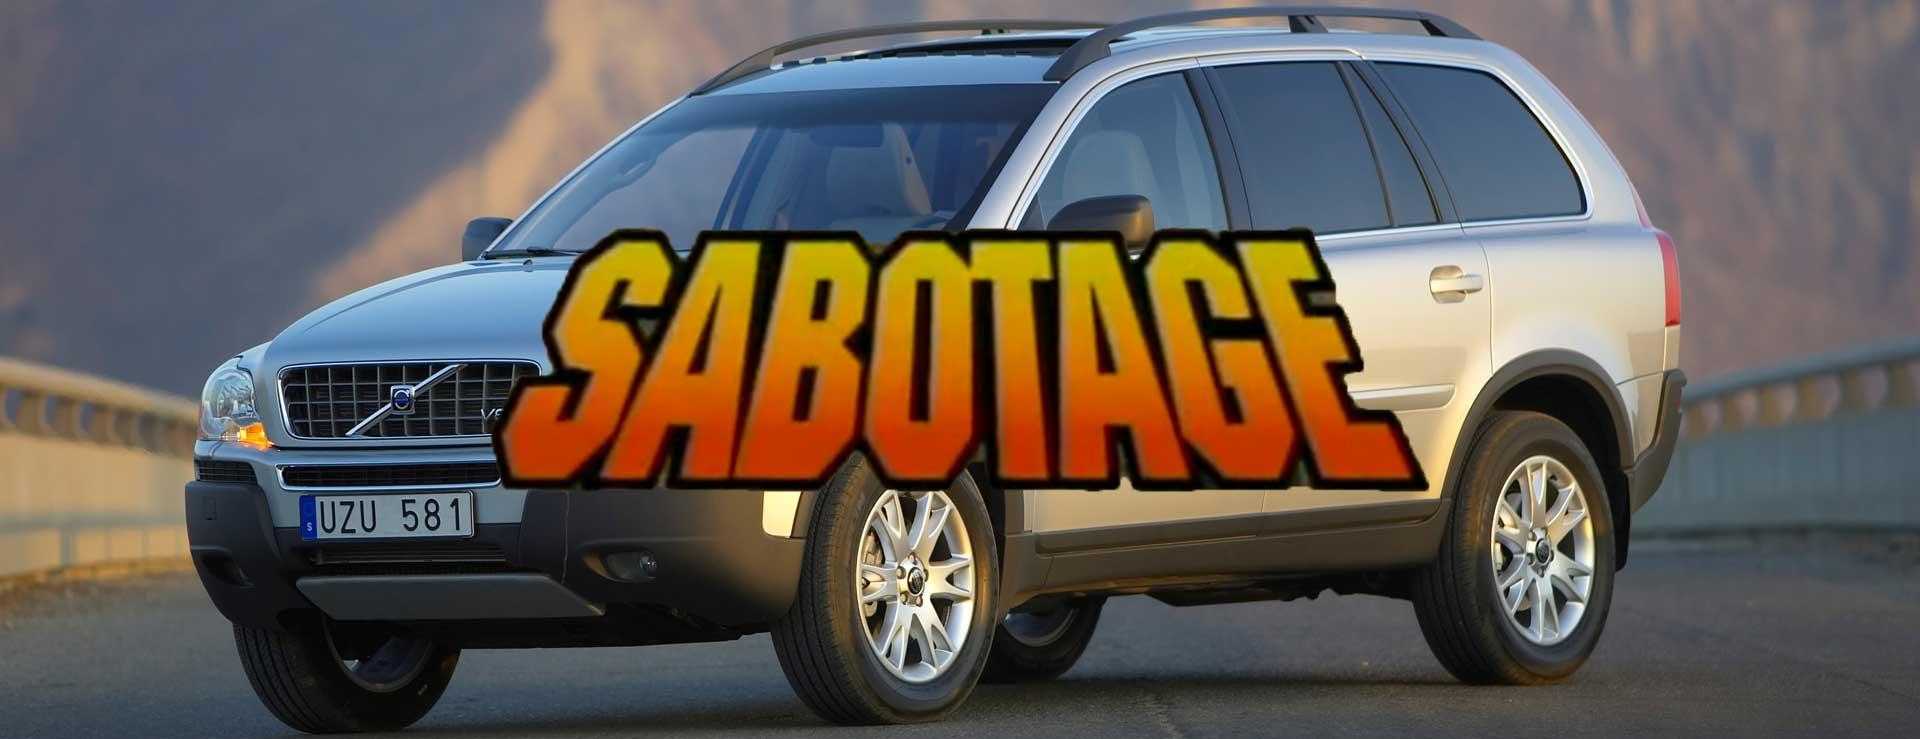 XC90 Sabotage -